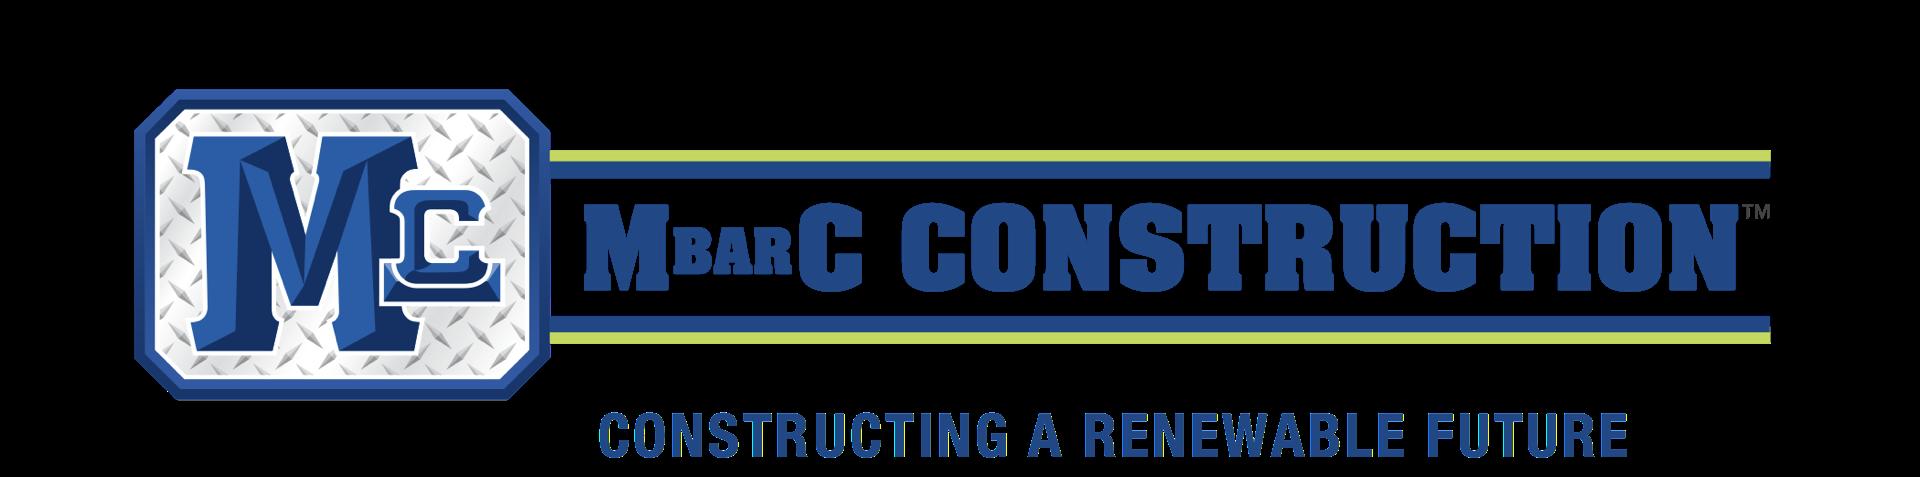 M Bar C Construction, constructing a renewable future.png